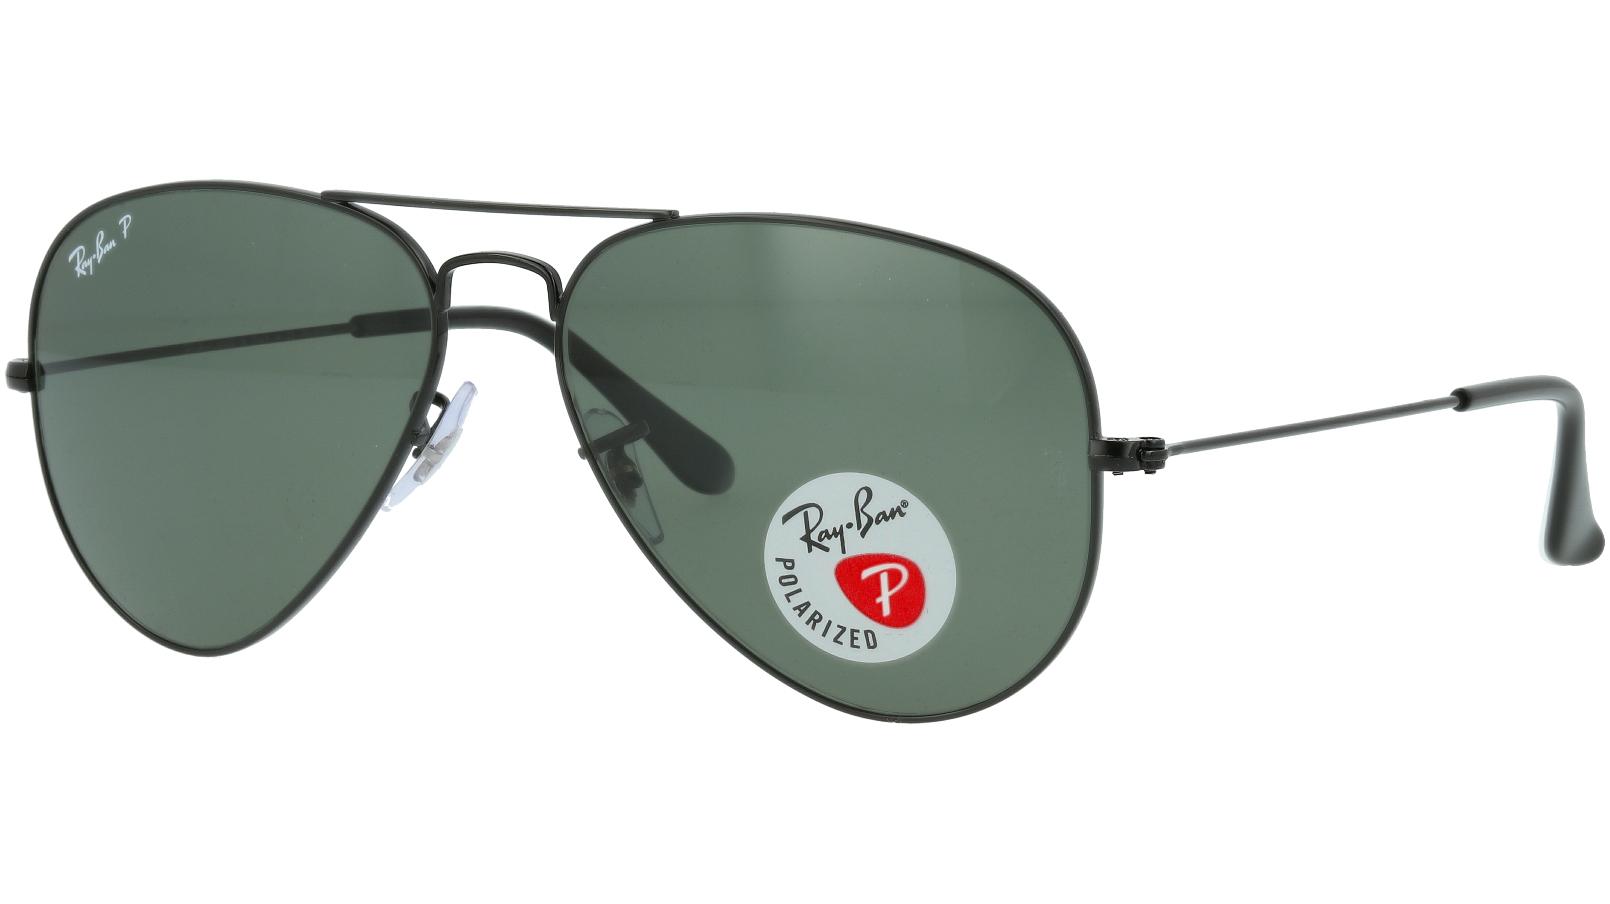 Ray-Ban RB3025 002/58 58 Arista Polarized Sunglasses